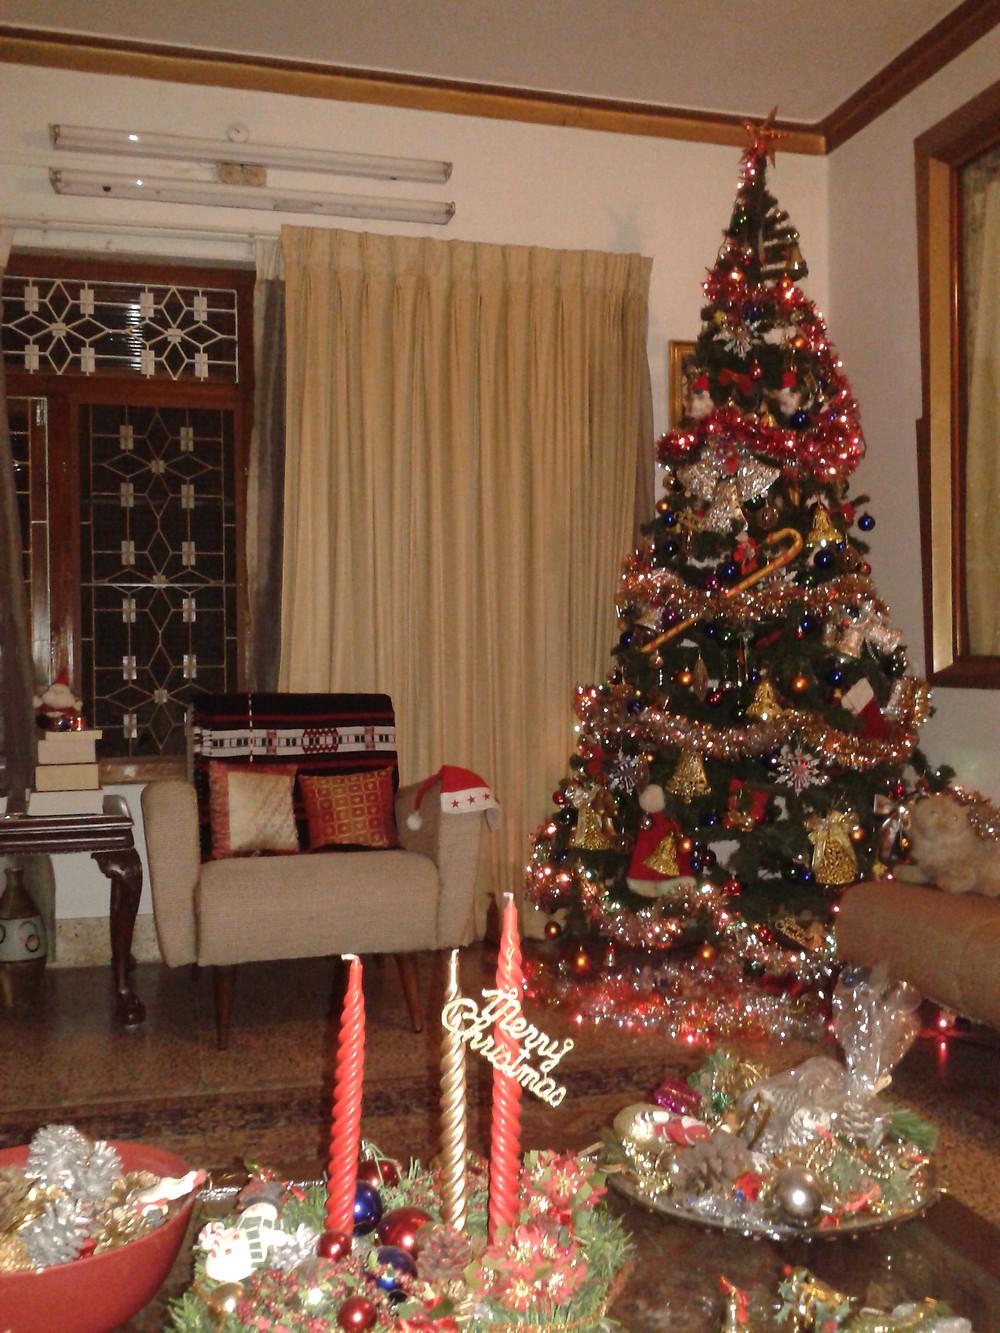 Christmas tree, Kerala, India Photo credit: Jmnooranal